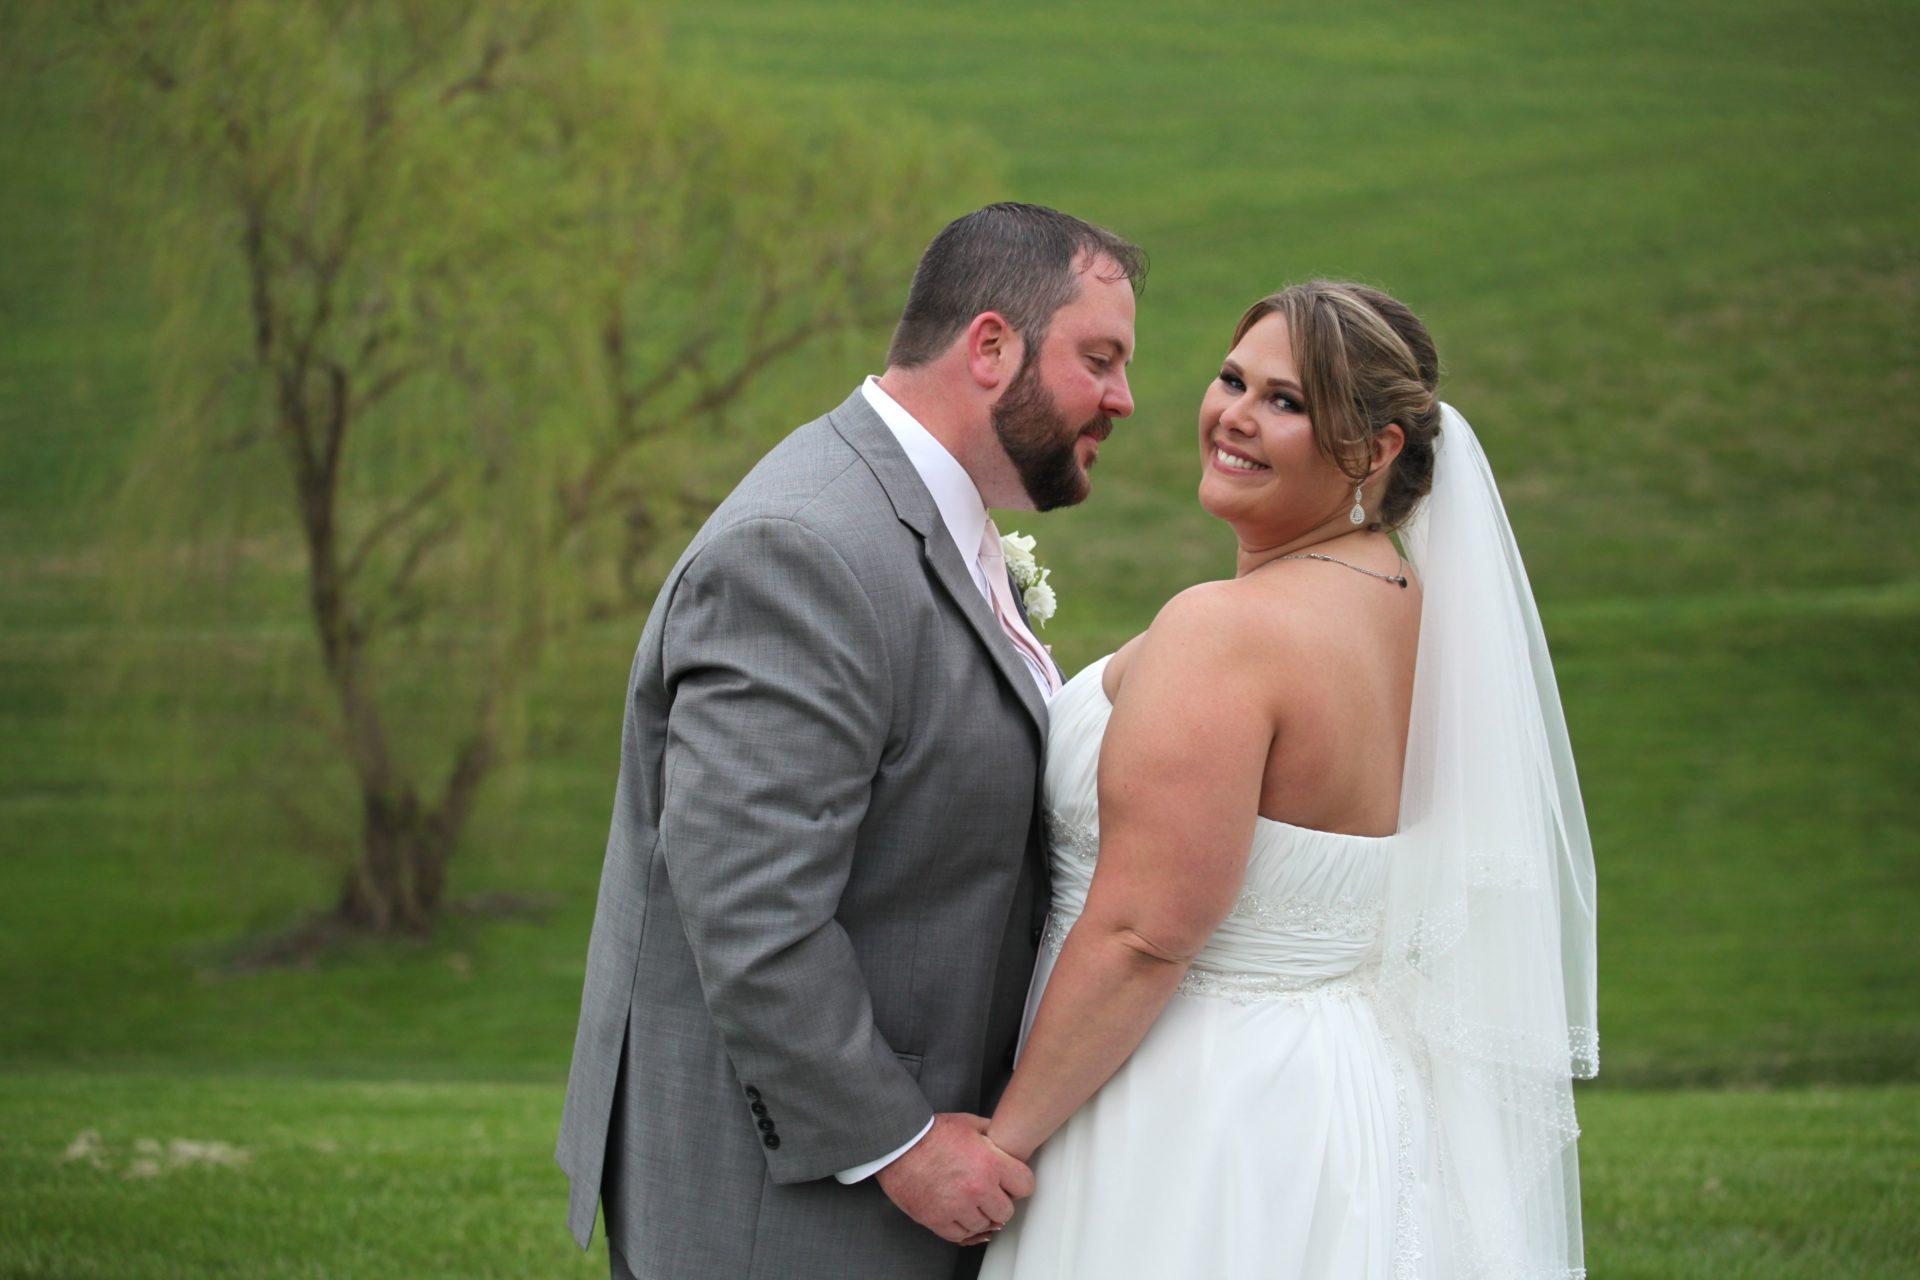 Sam & Amy's Wedding April 15 2017